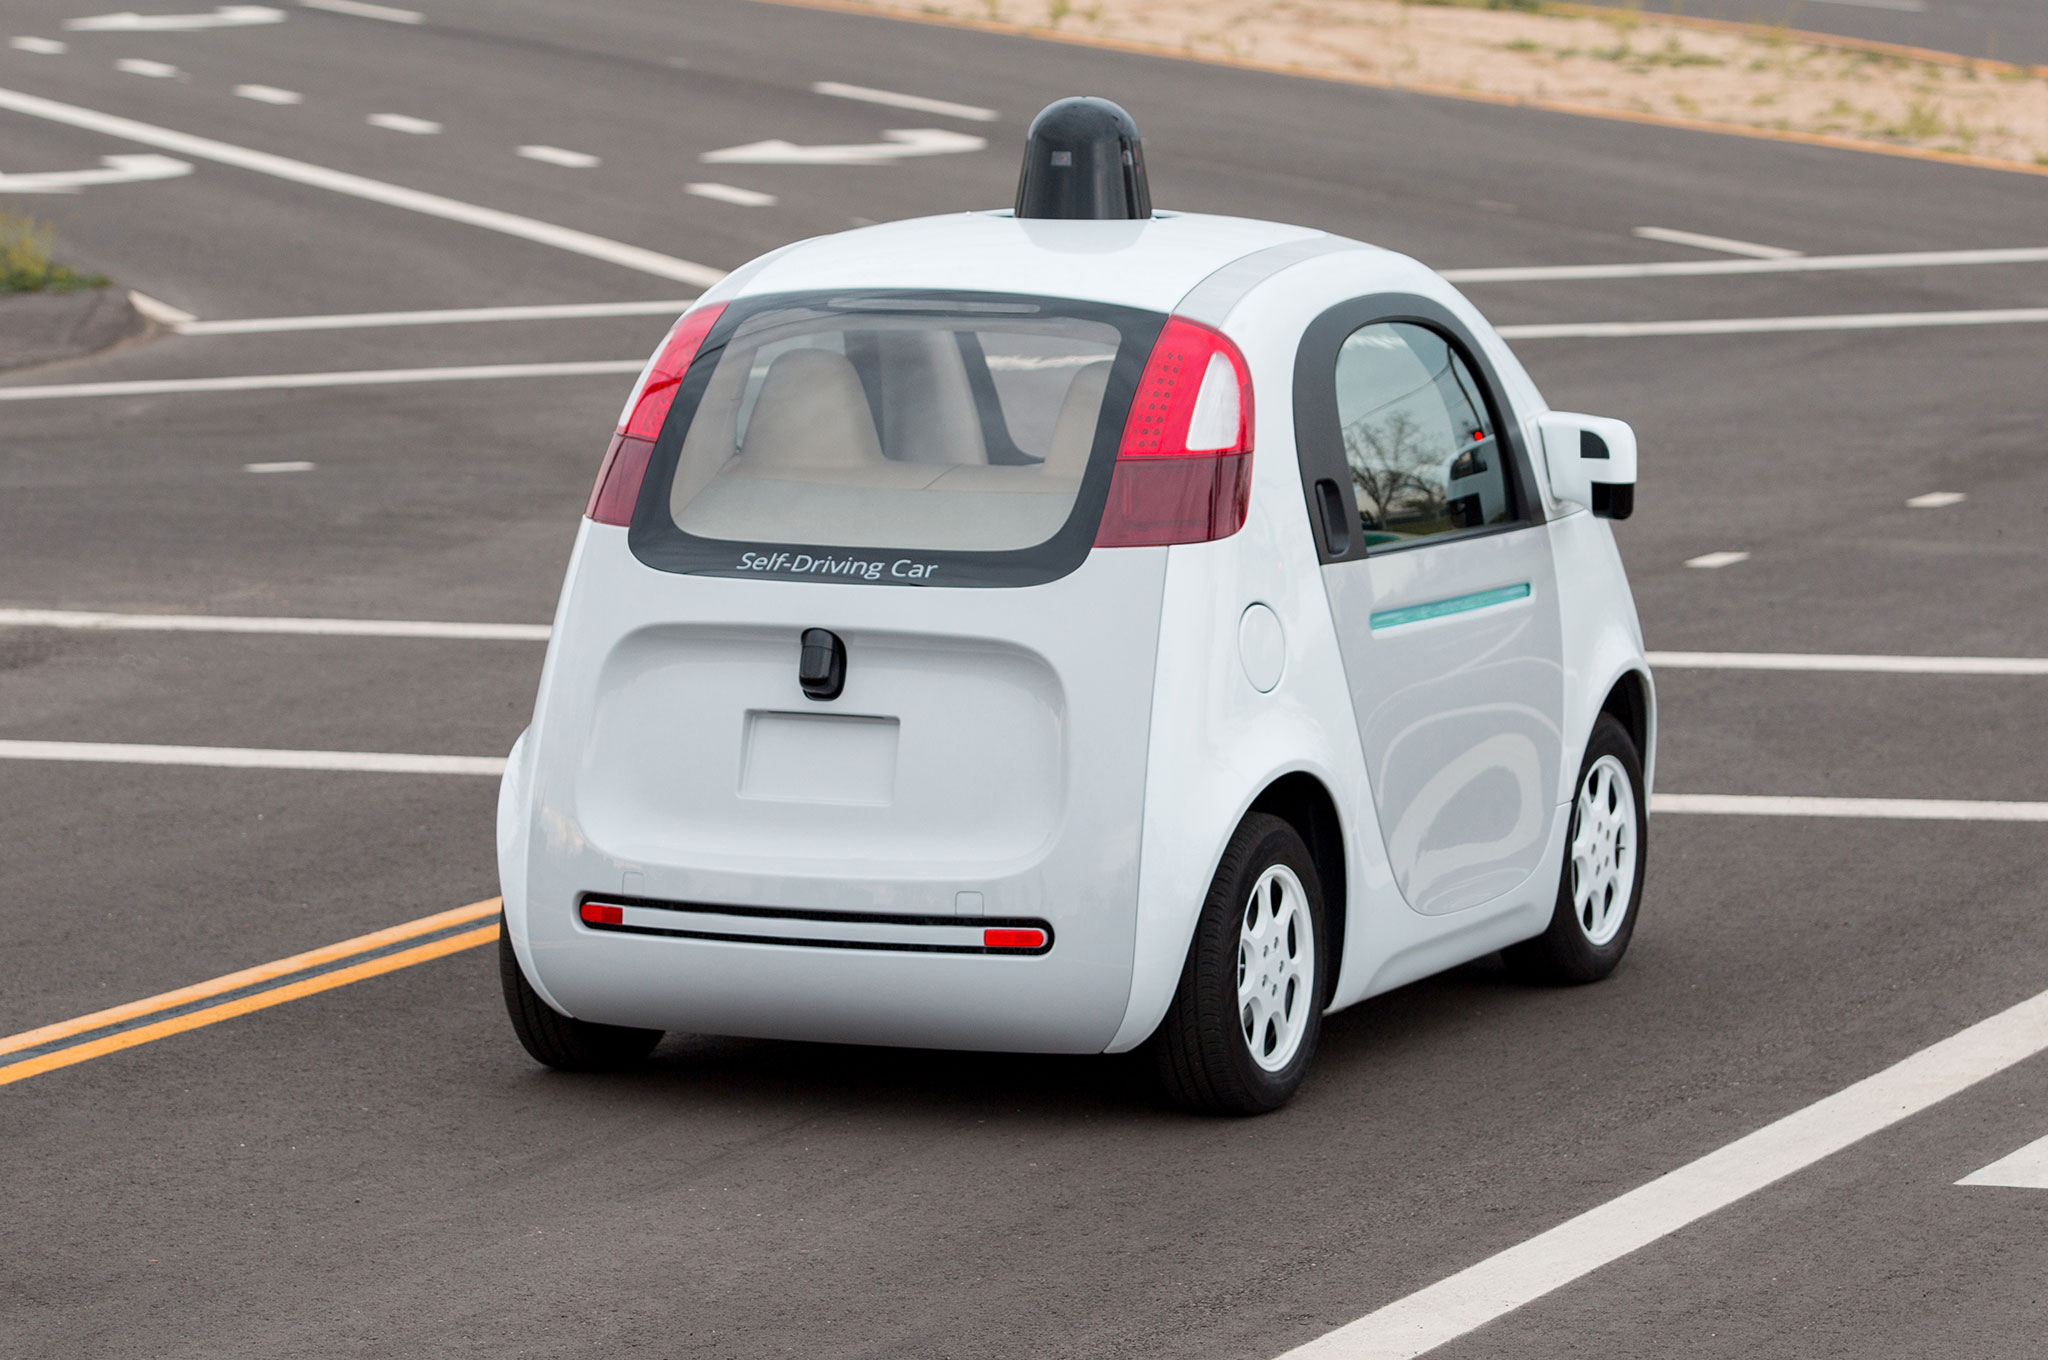 Third Party Dmv >> California DMV Puts the Brakes on Google Autonomous Cars